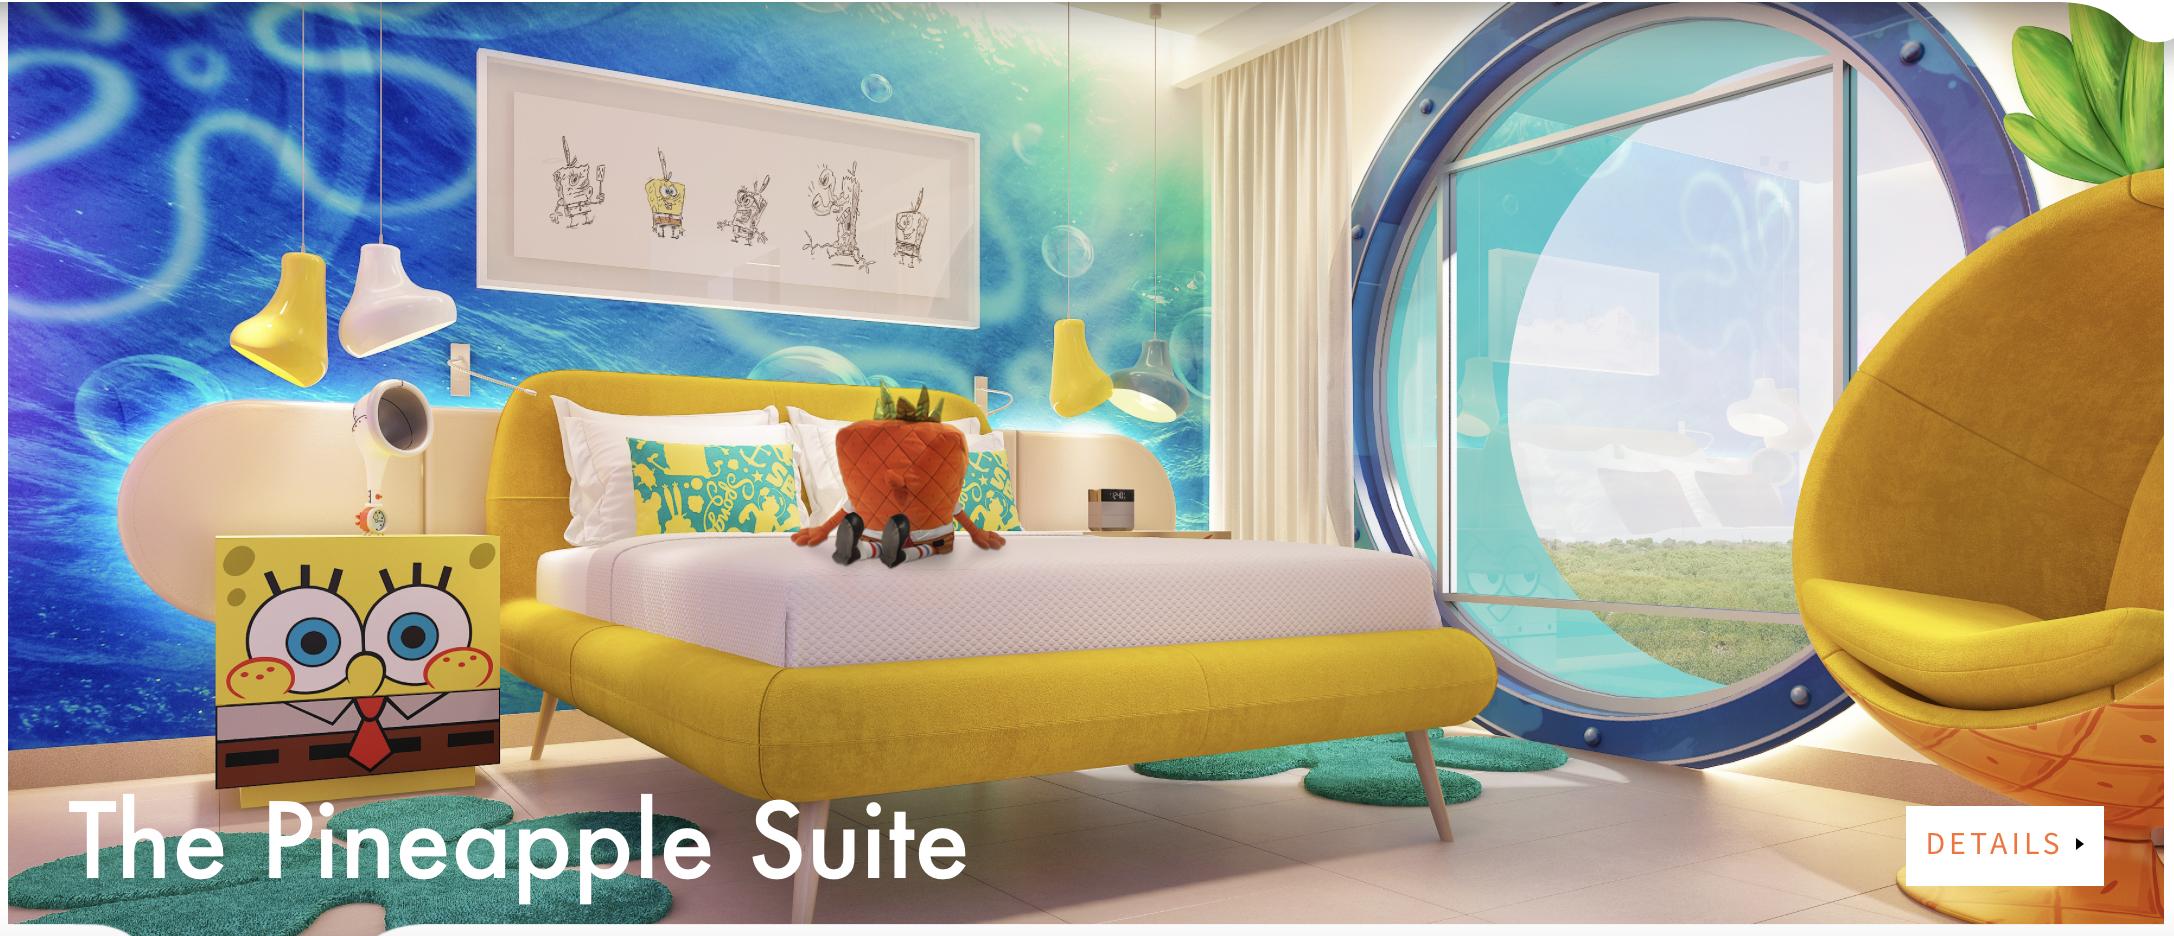 Pineapple Suite